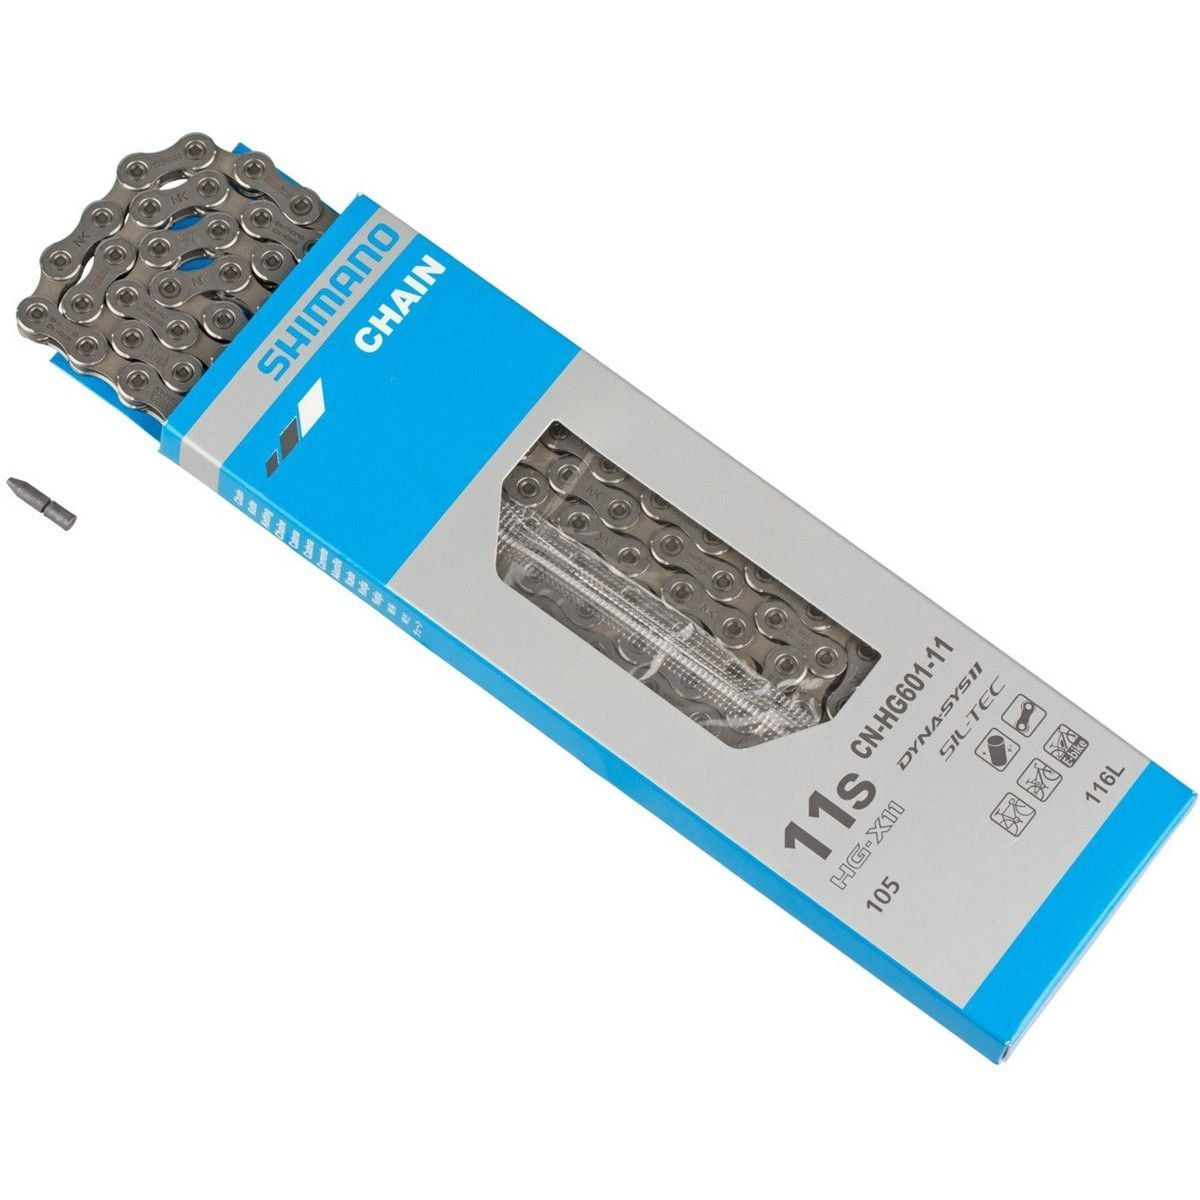 Grupo Shimano Deore XT M8000 11v K7 11/46 dentes - sem pedivela